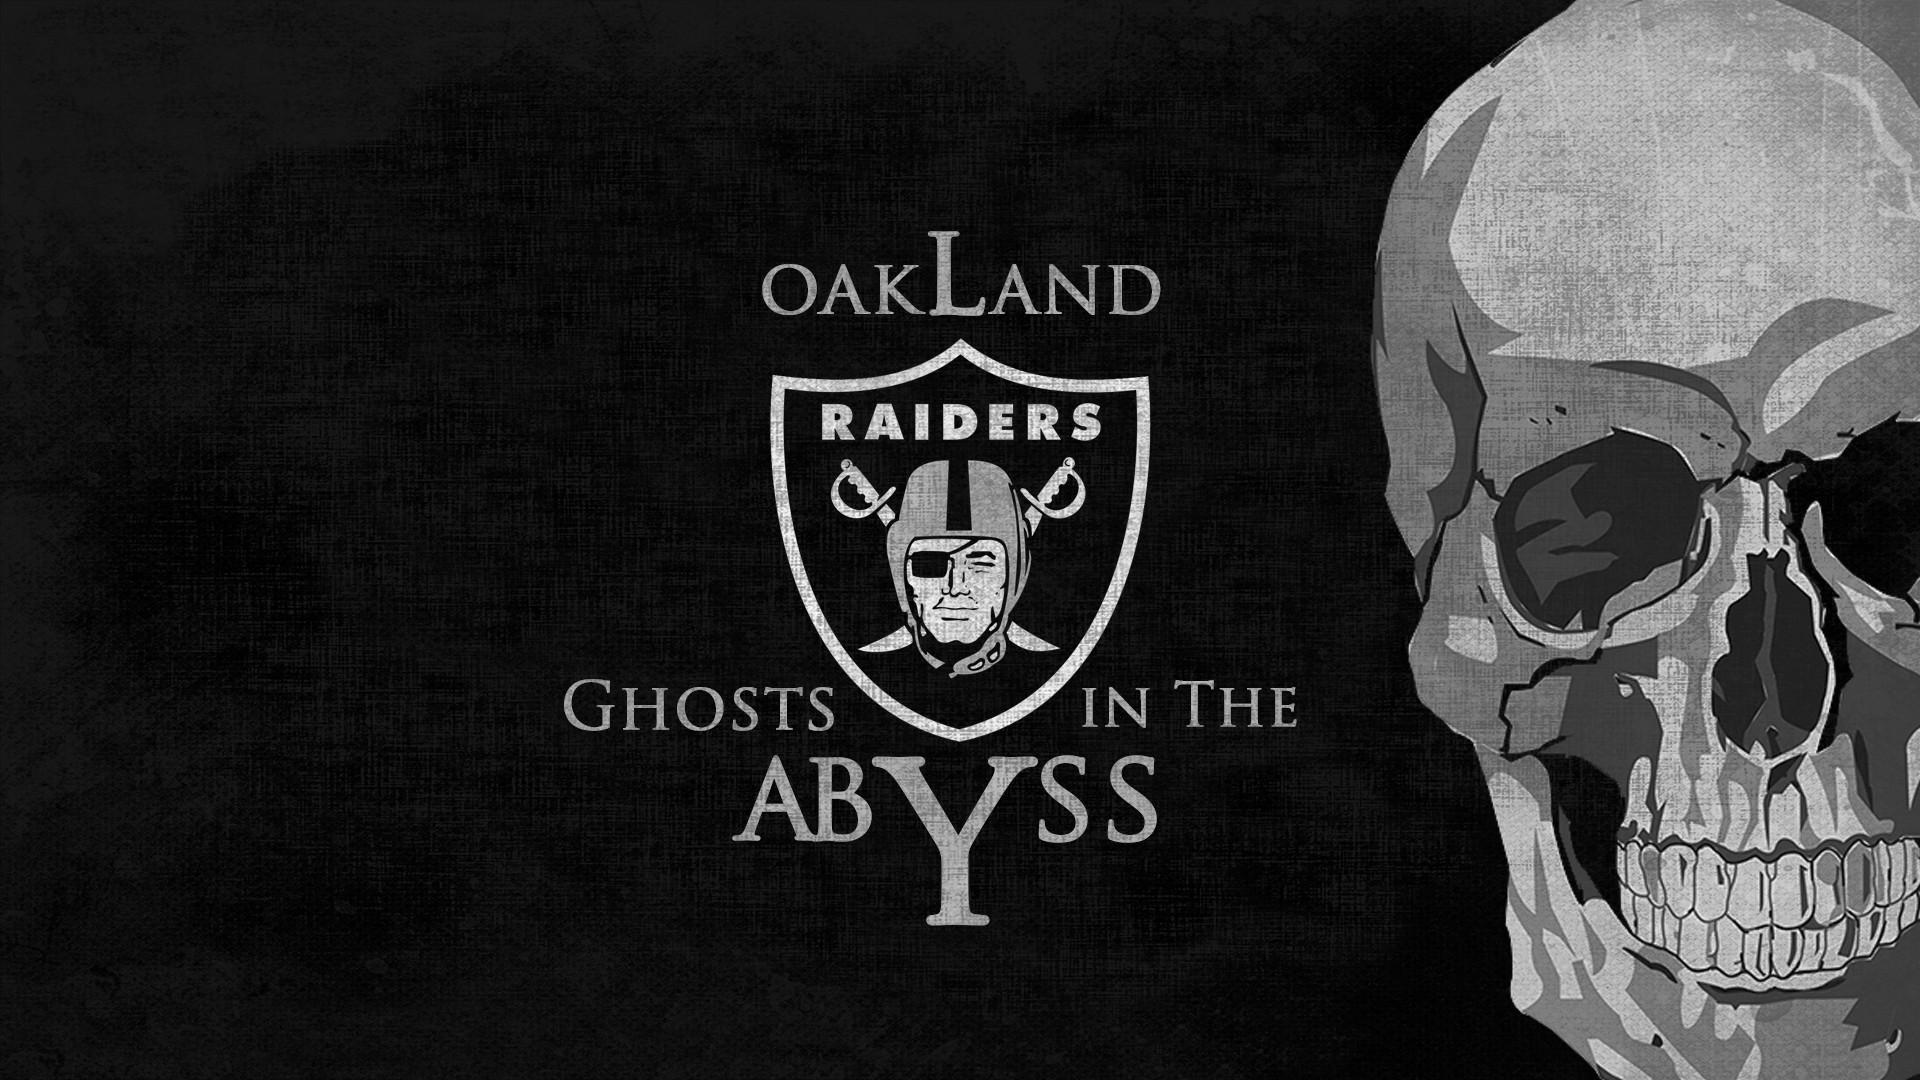 Oakland Raiders Live Wallpaper For Desktop Free Download